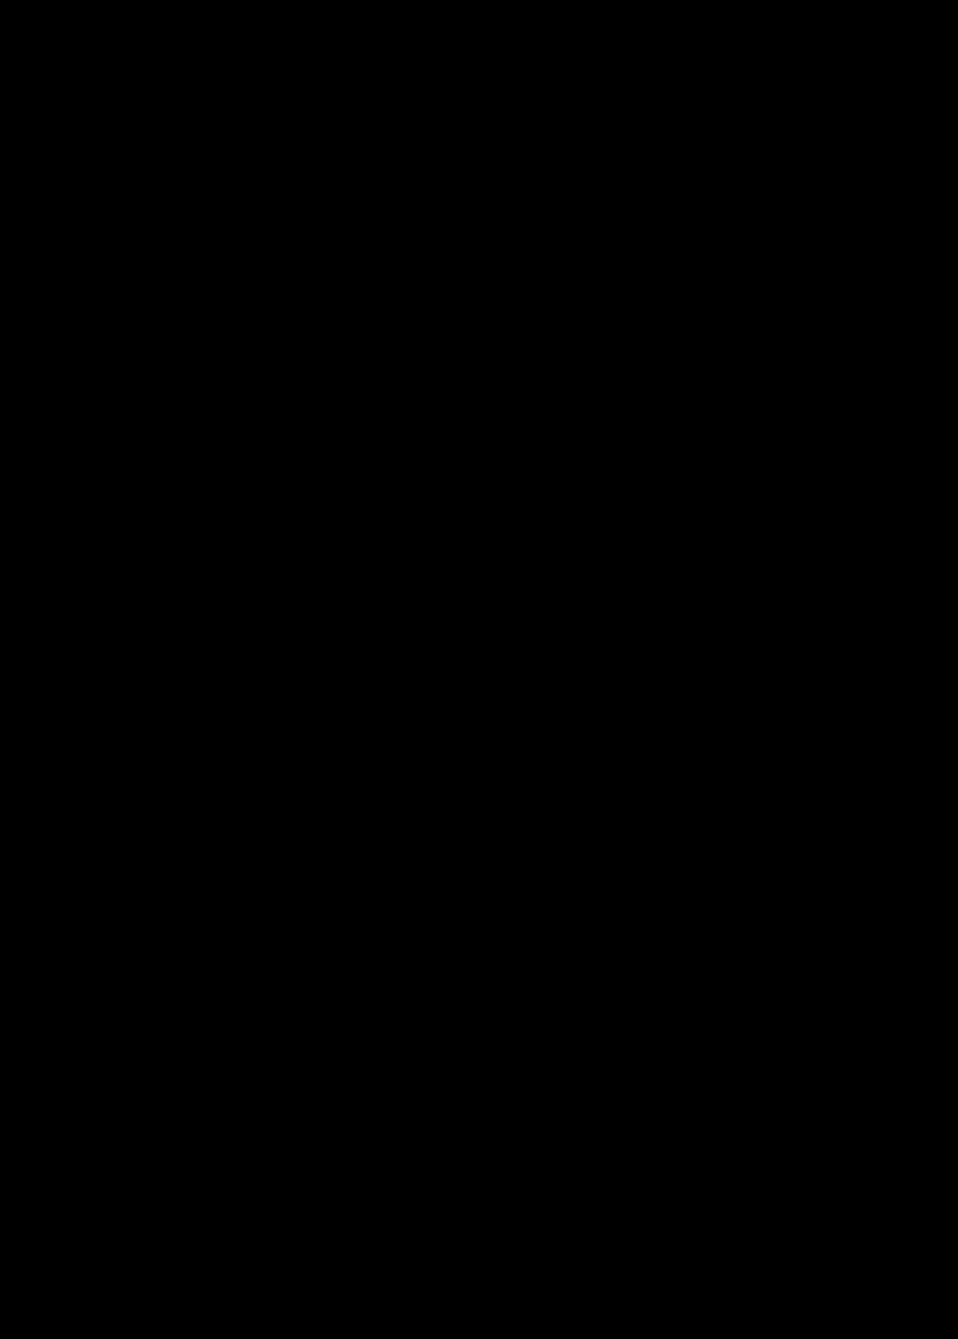 Illustration of black design : Free Stock Photo